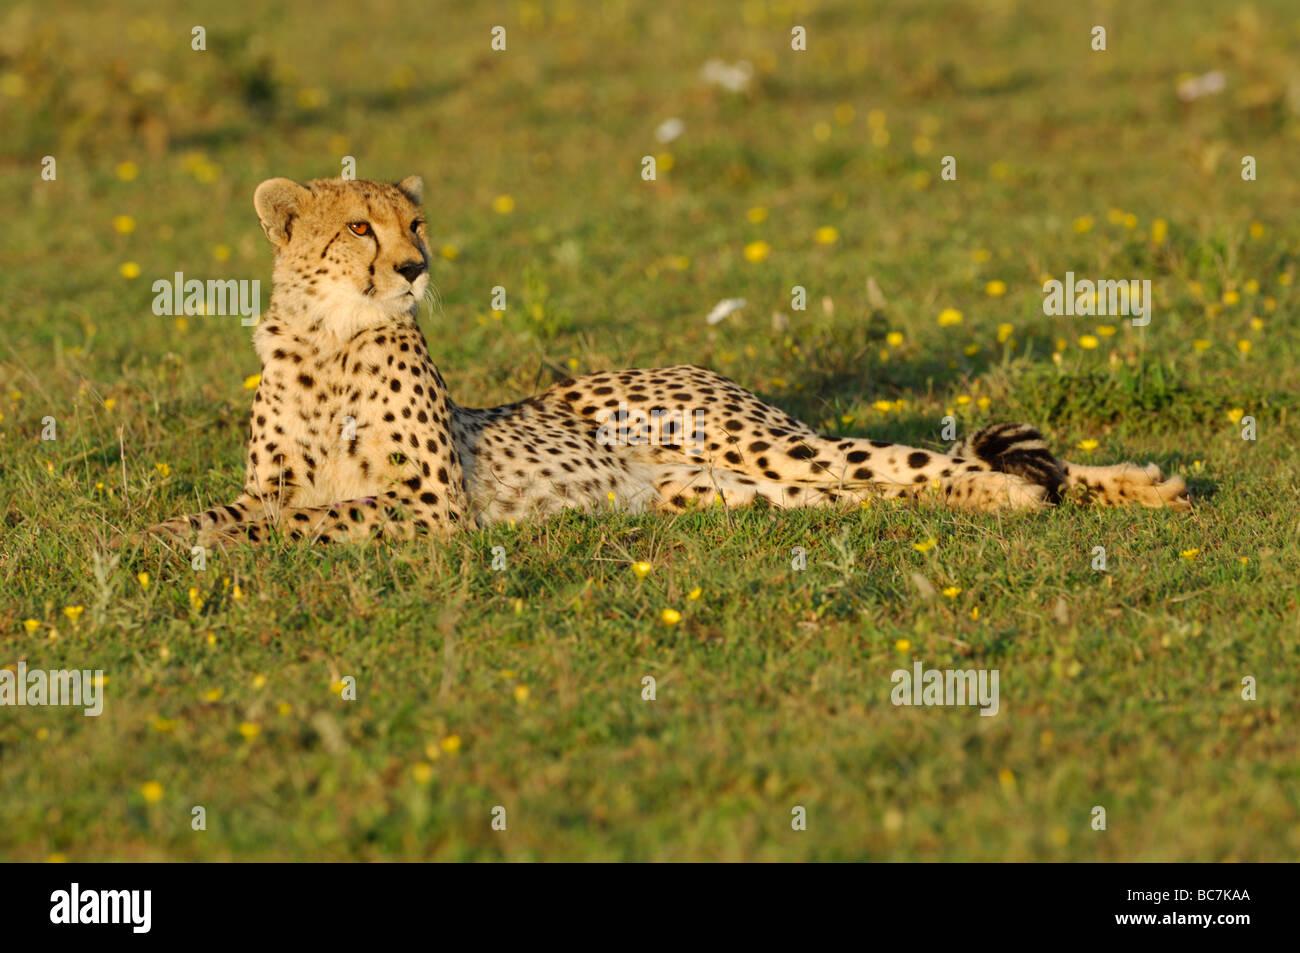 short paragraph on cheetah